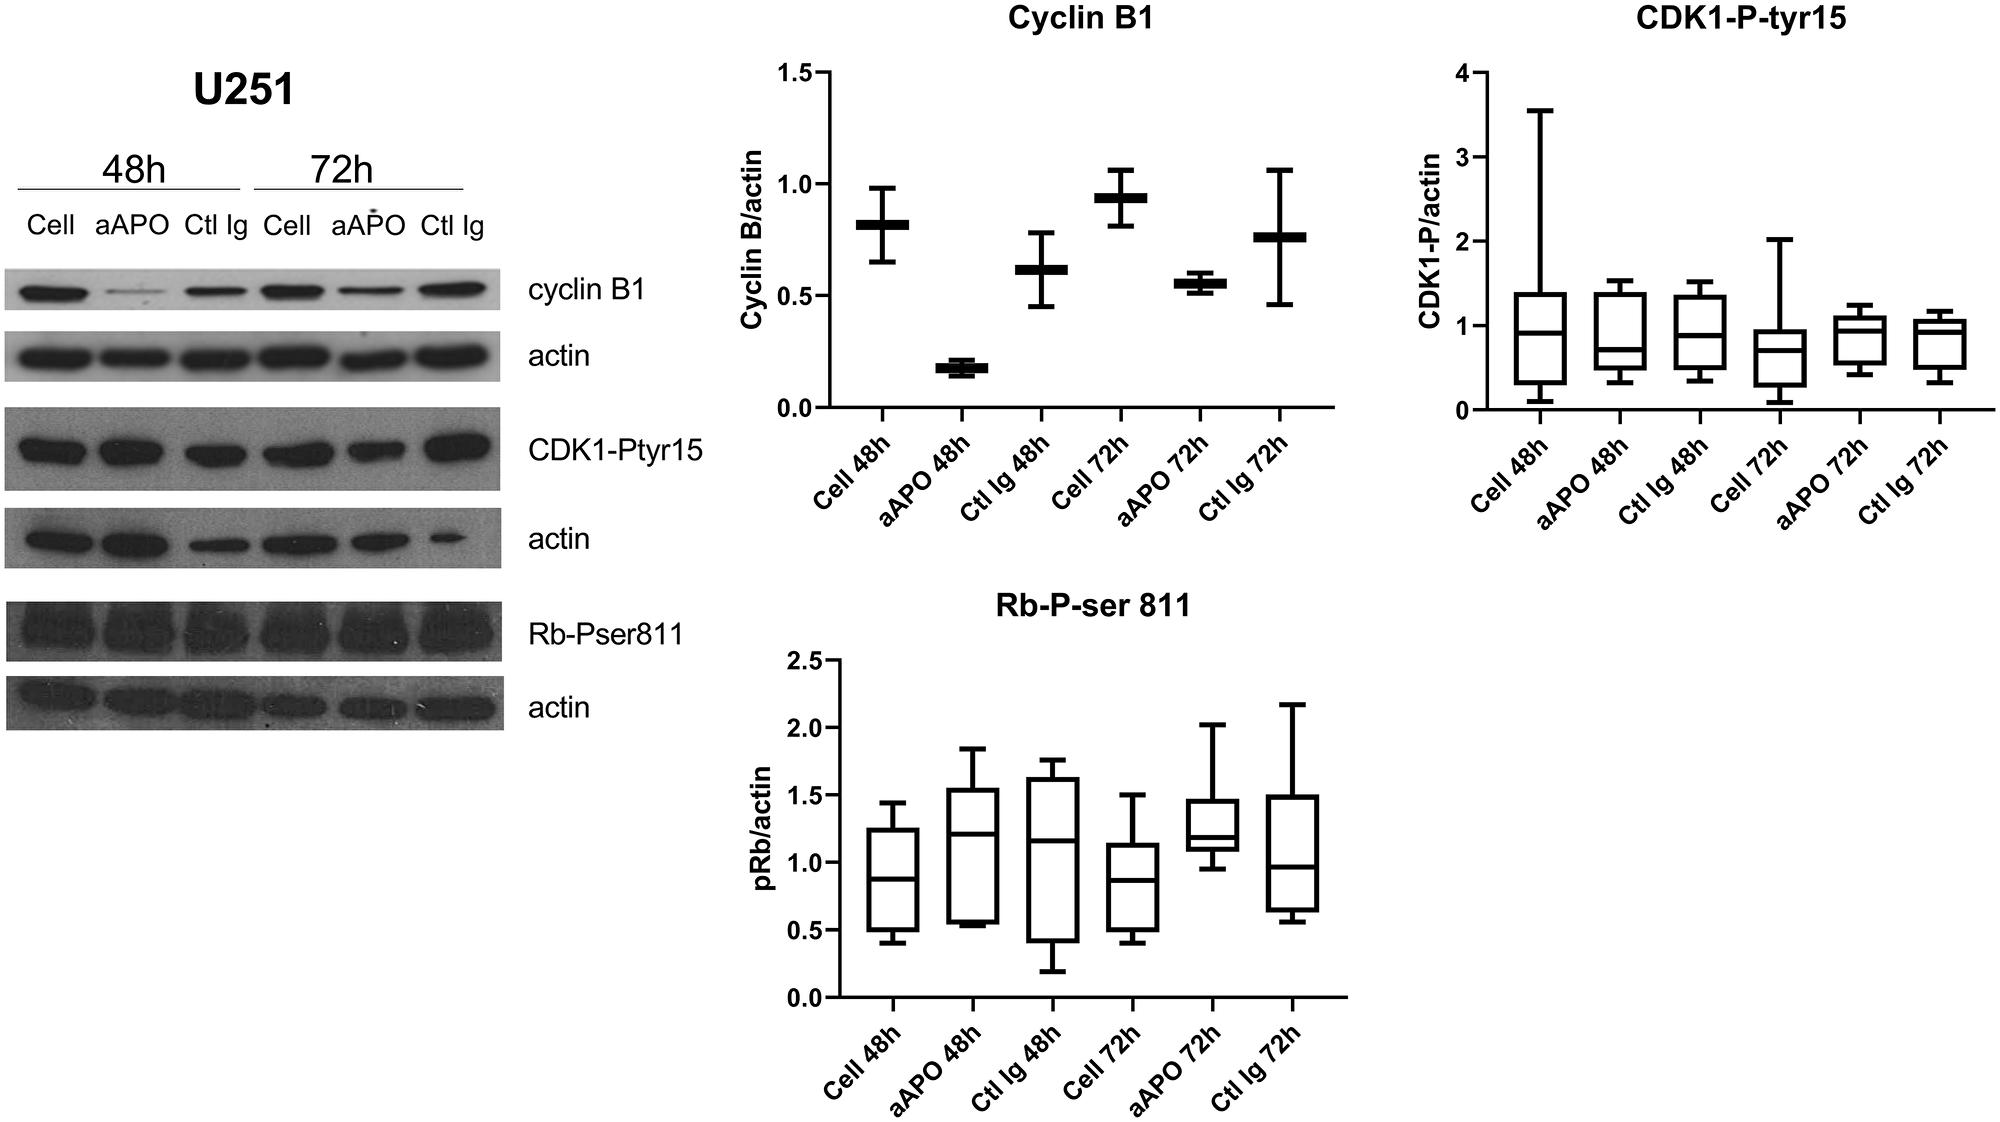 Anti-apo-A1 IgGs induced a down-expression of cyclin B1 in U251.